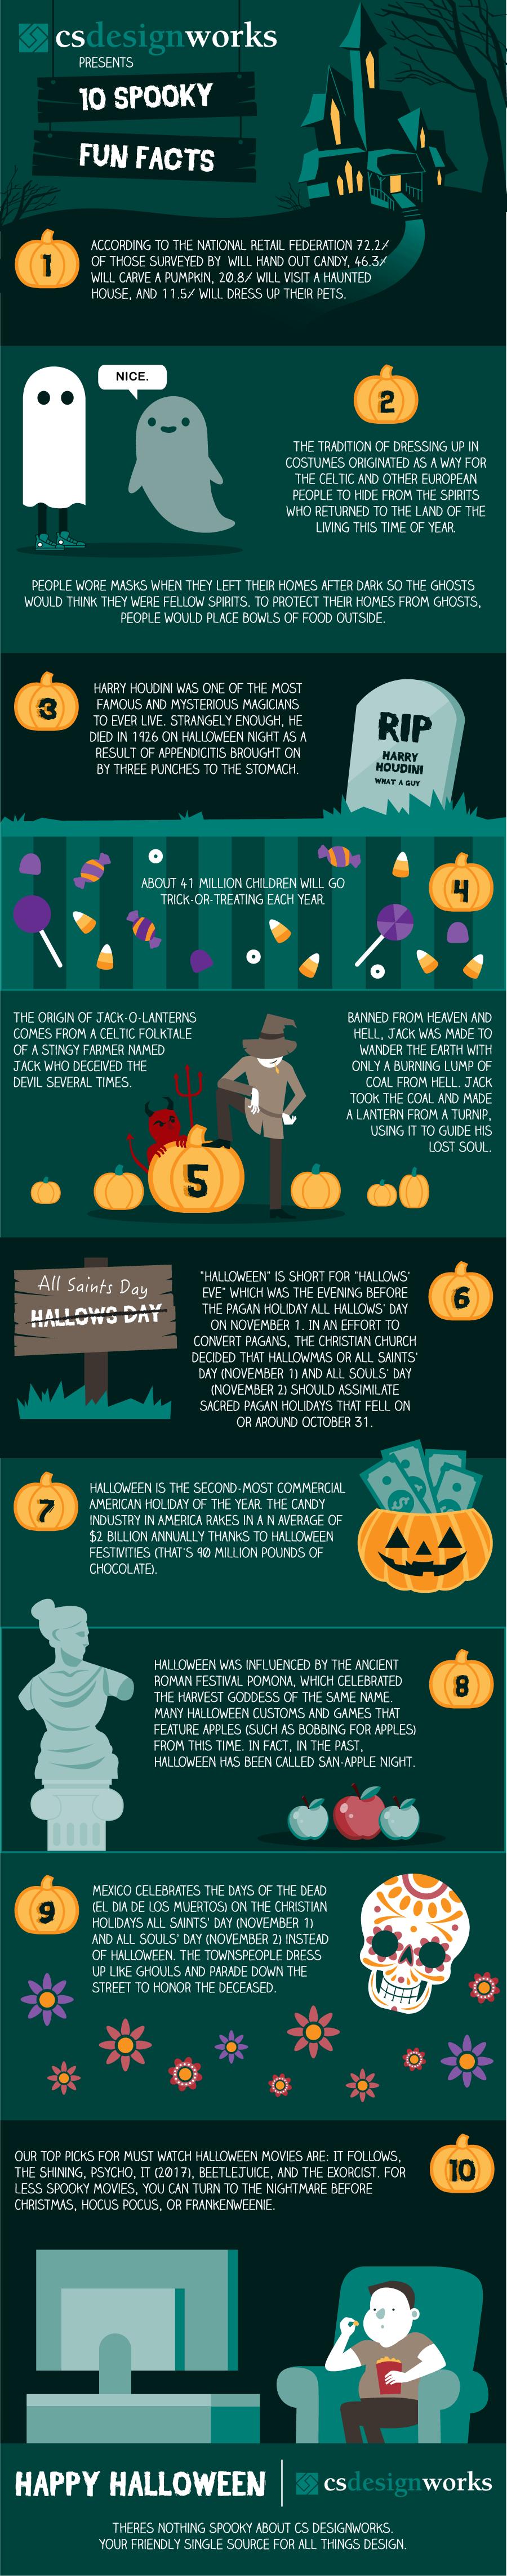 Ten Spooky Fun Facts About Halloween